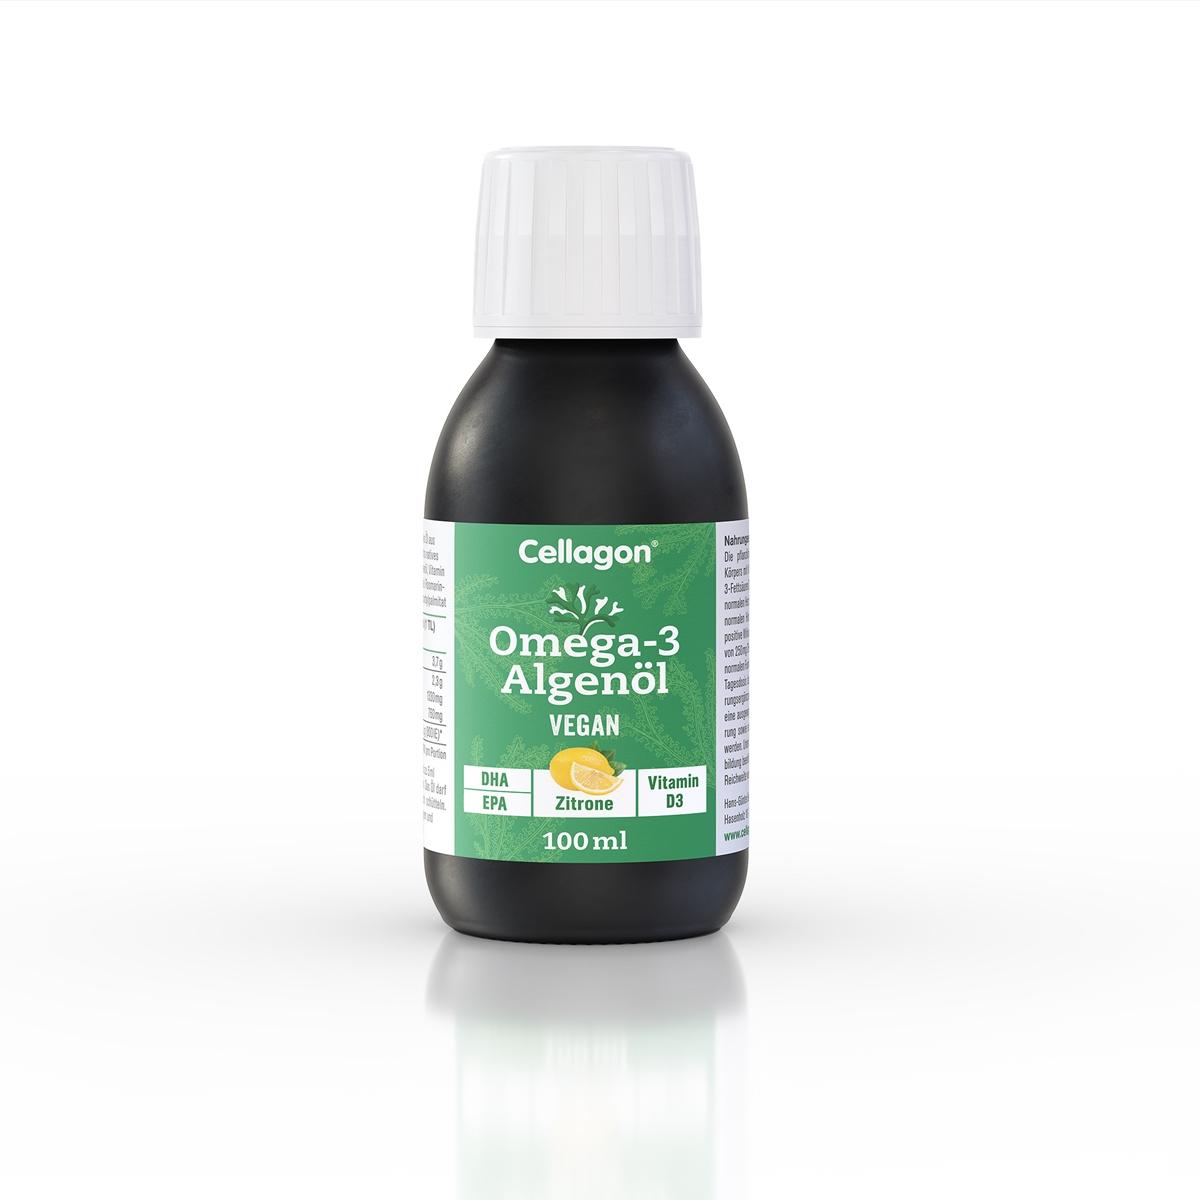 Cellagon Omega-3 Algenöl - Zitrone